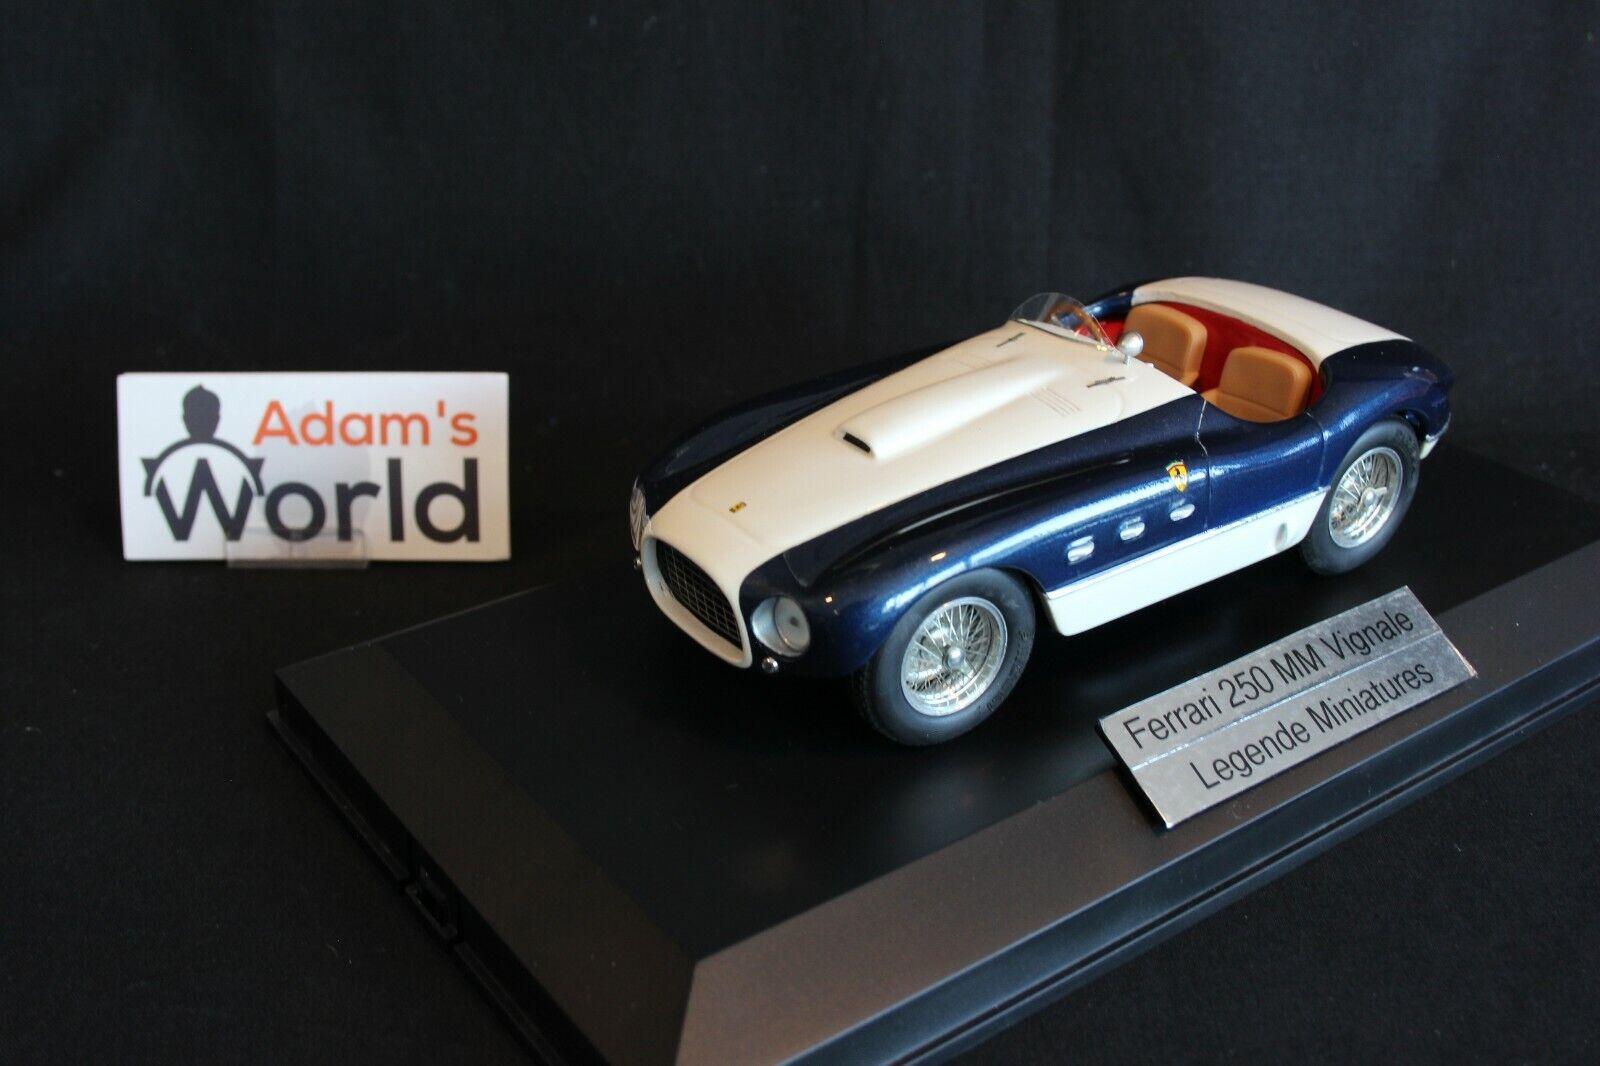 ventas en linea Legende Miniatures Ferrari 250 MM Vignale 1 18 18 18 azul   blancoo (PJBB)  mas barato